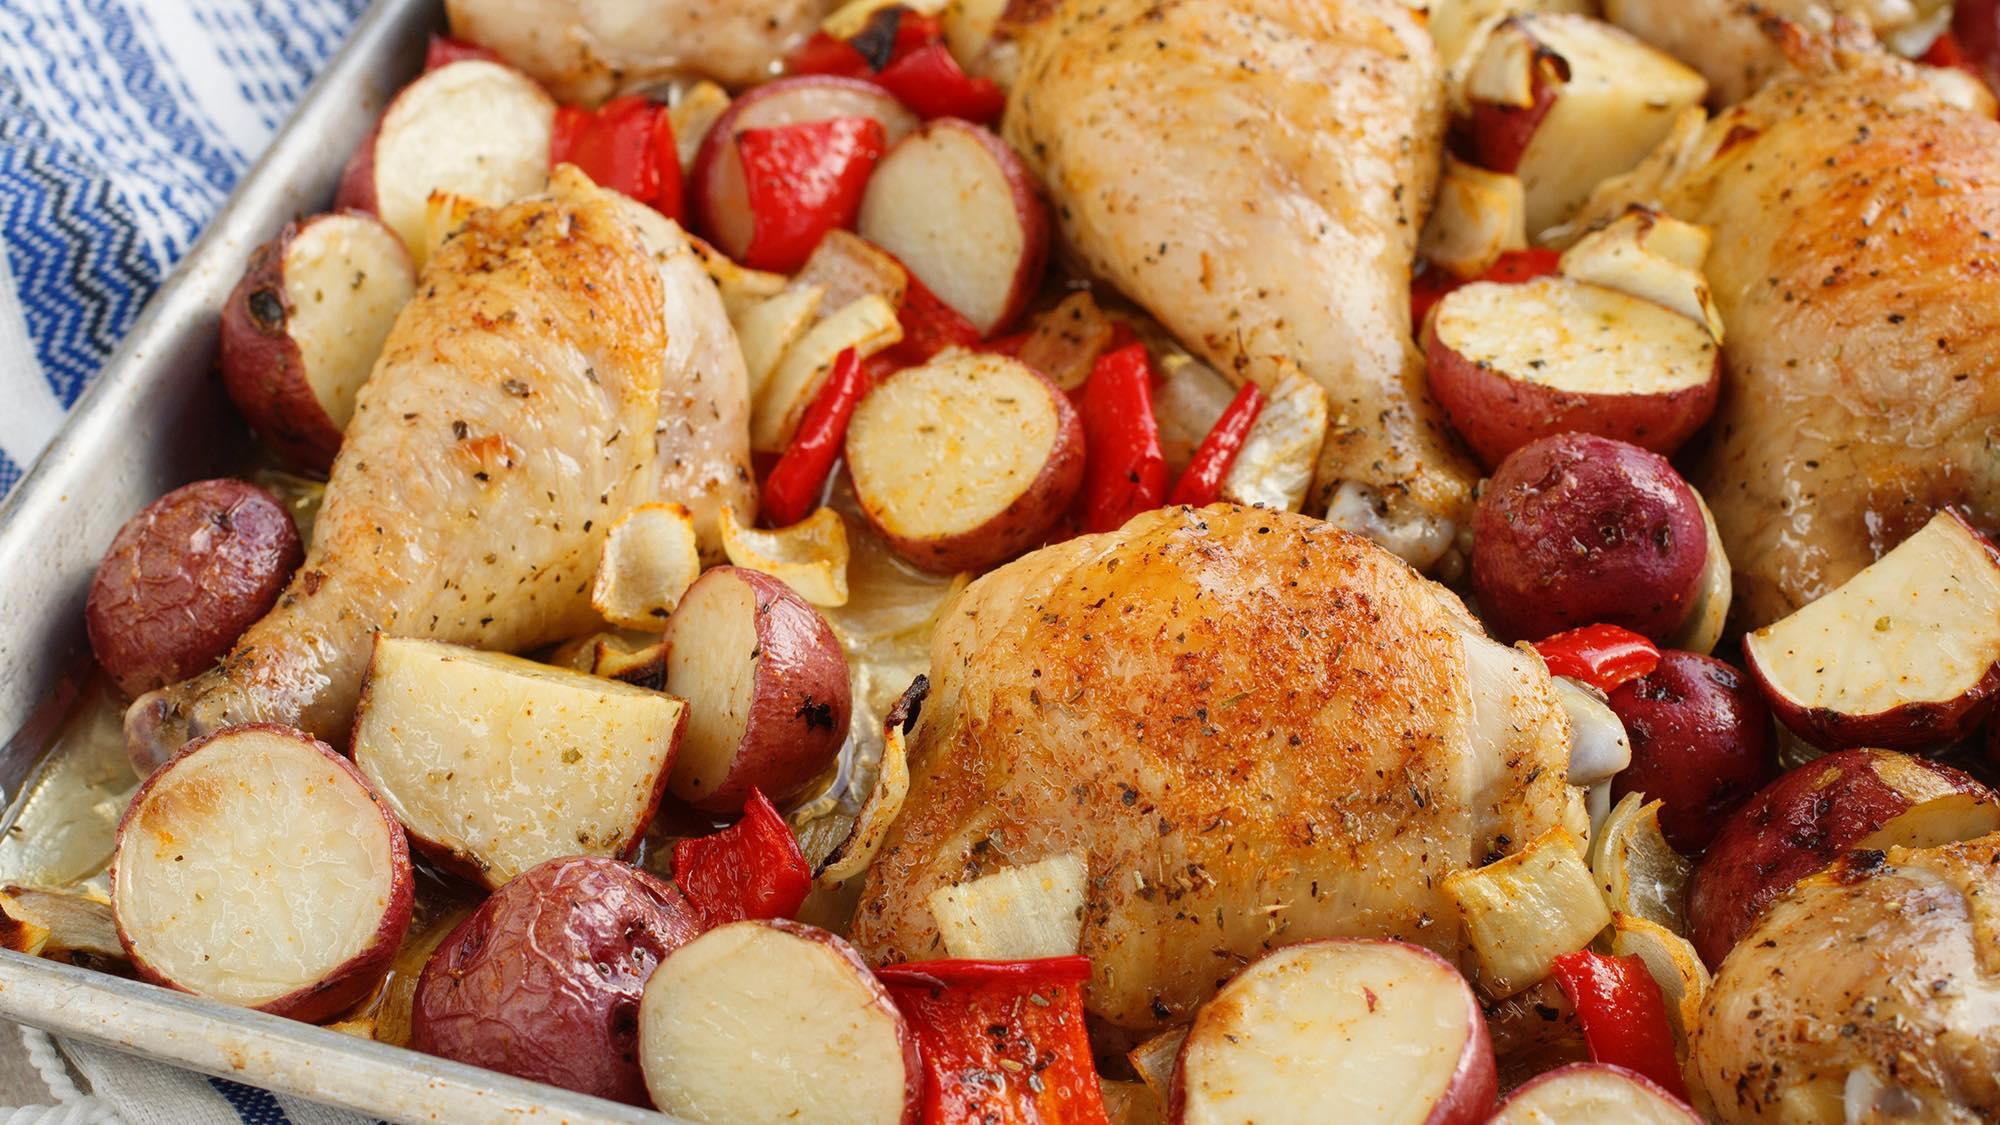 italian_roasted_chicken_and_potatoes_recipes_2000x1125.jpg